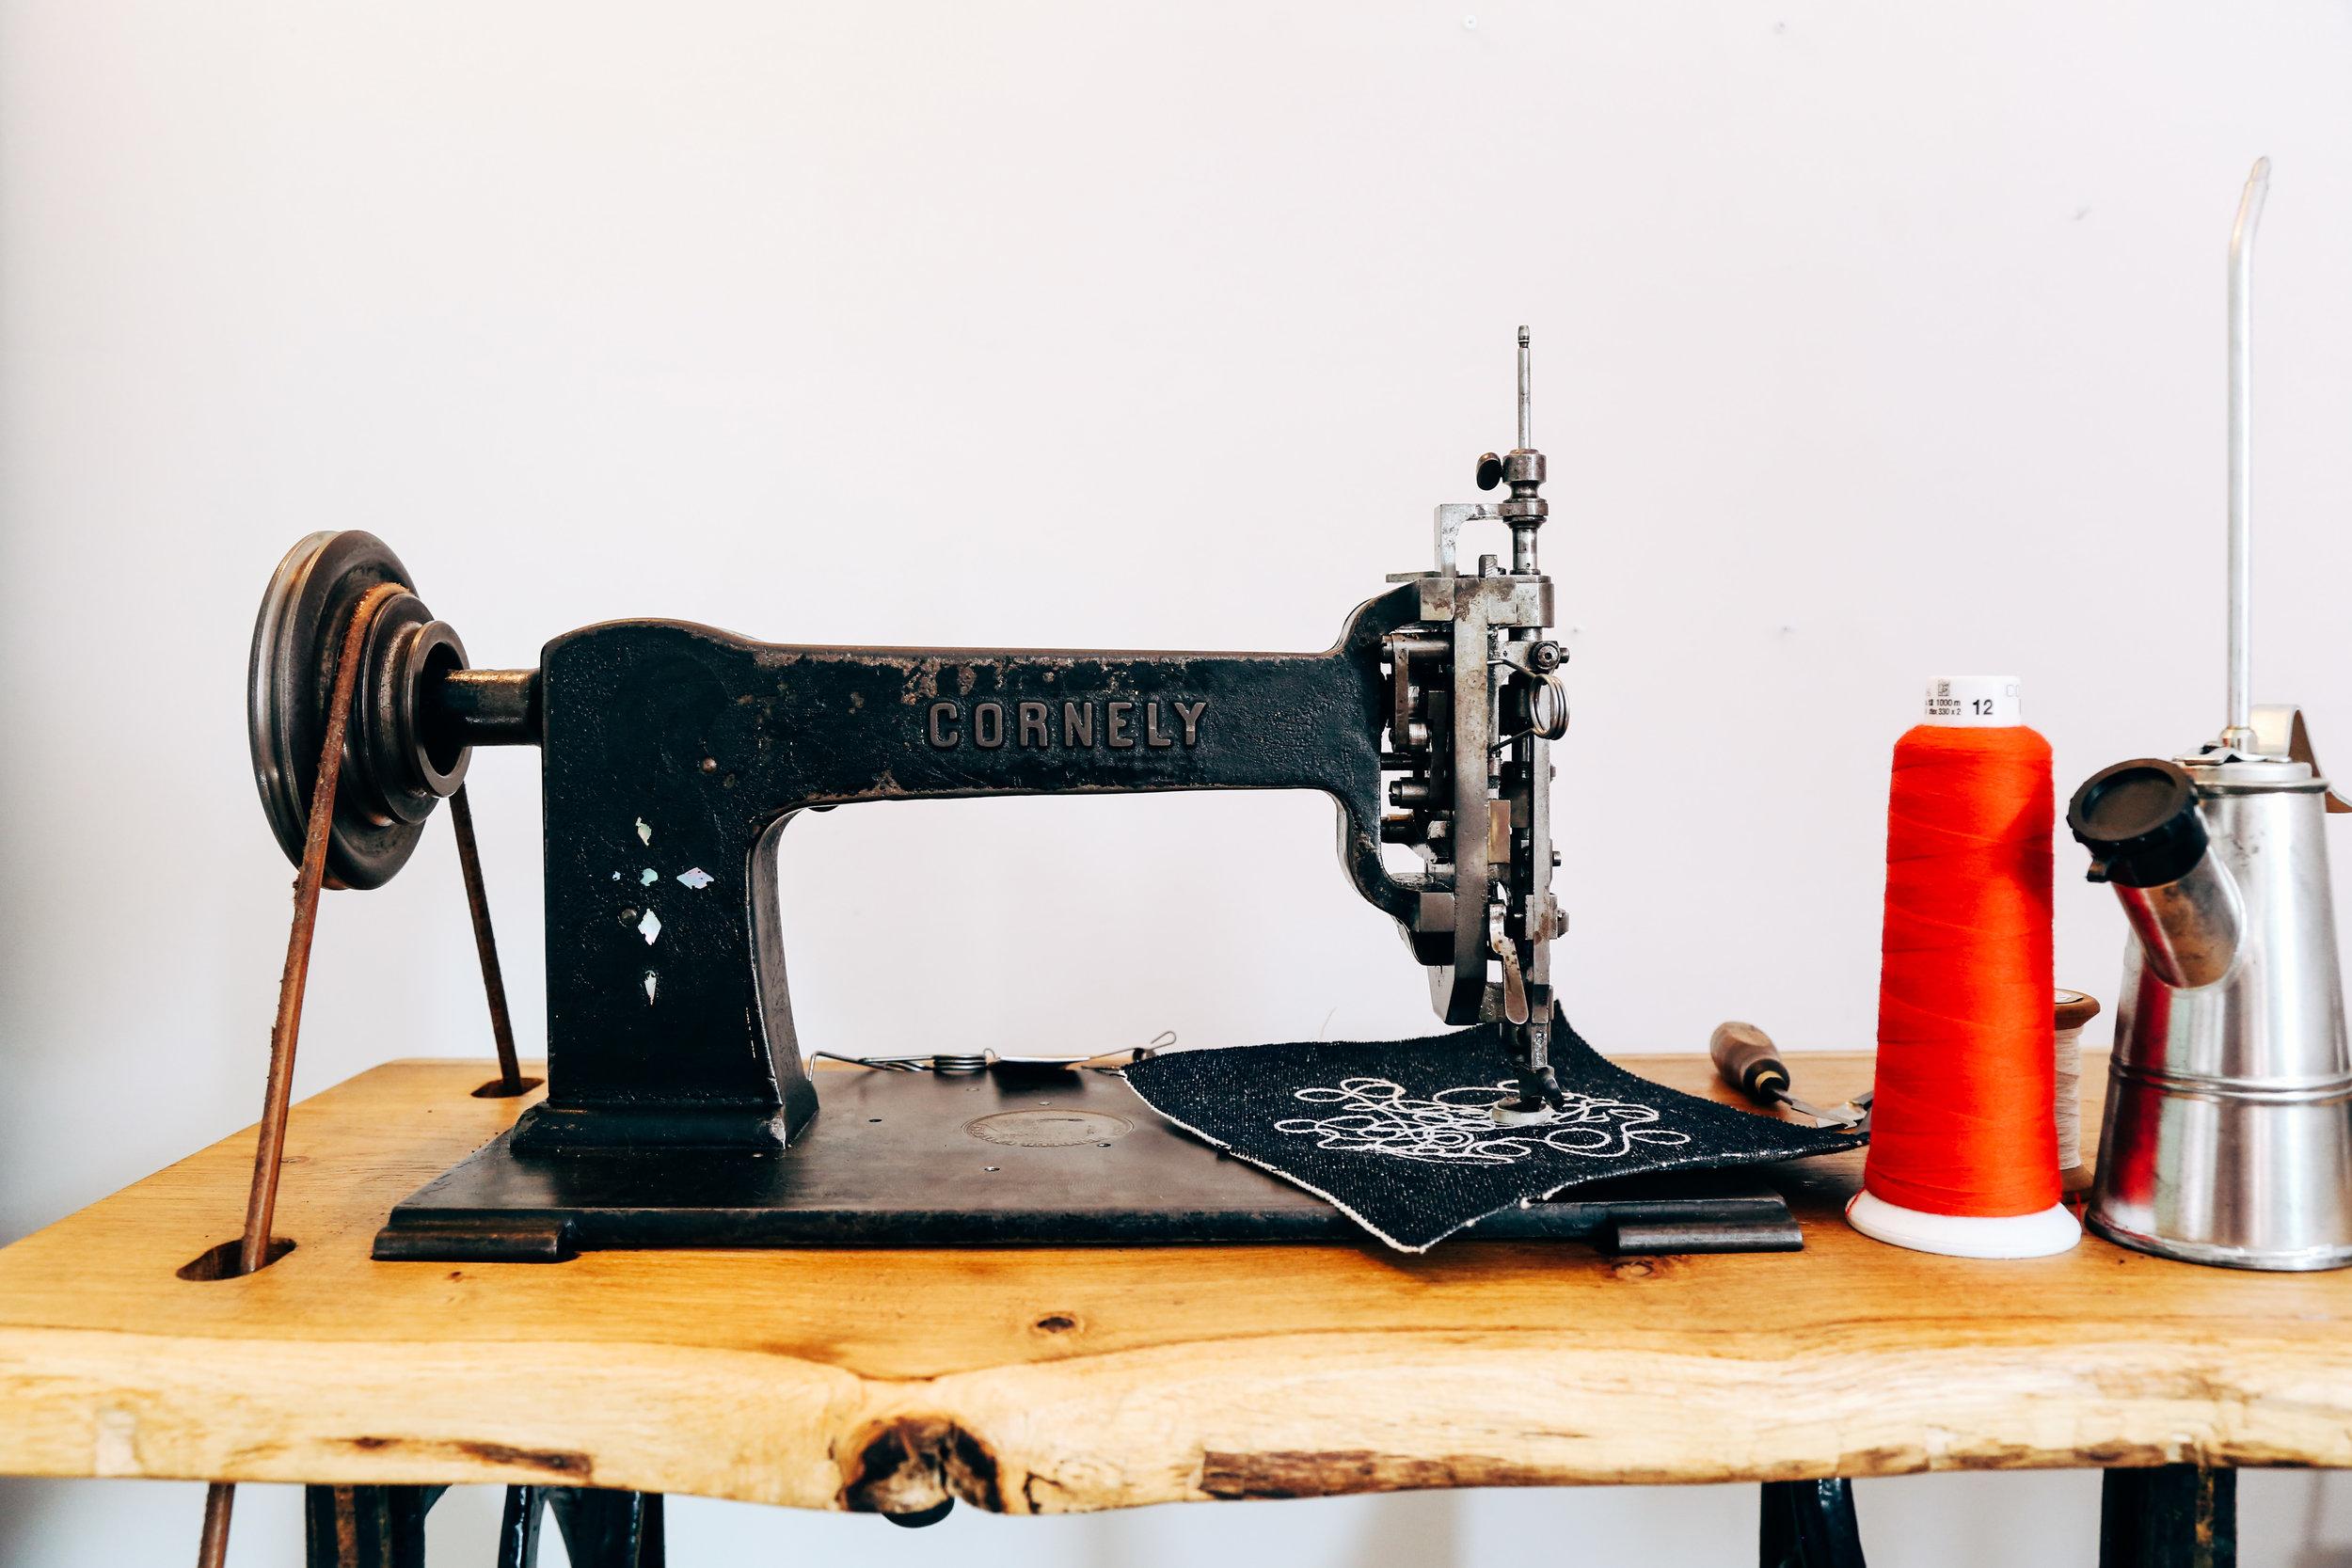 saintchains-chain-stitch-machine-cornely-a-handcrank-art-embroidery.jpg